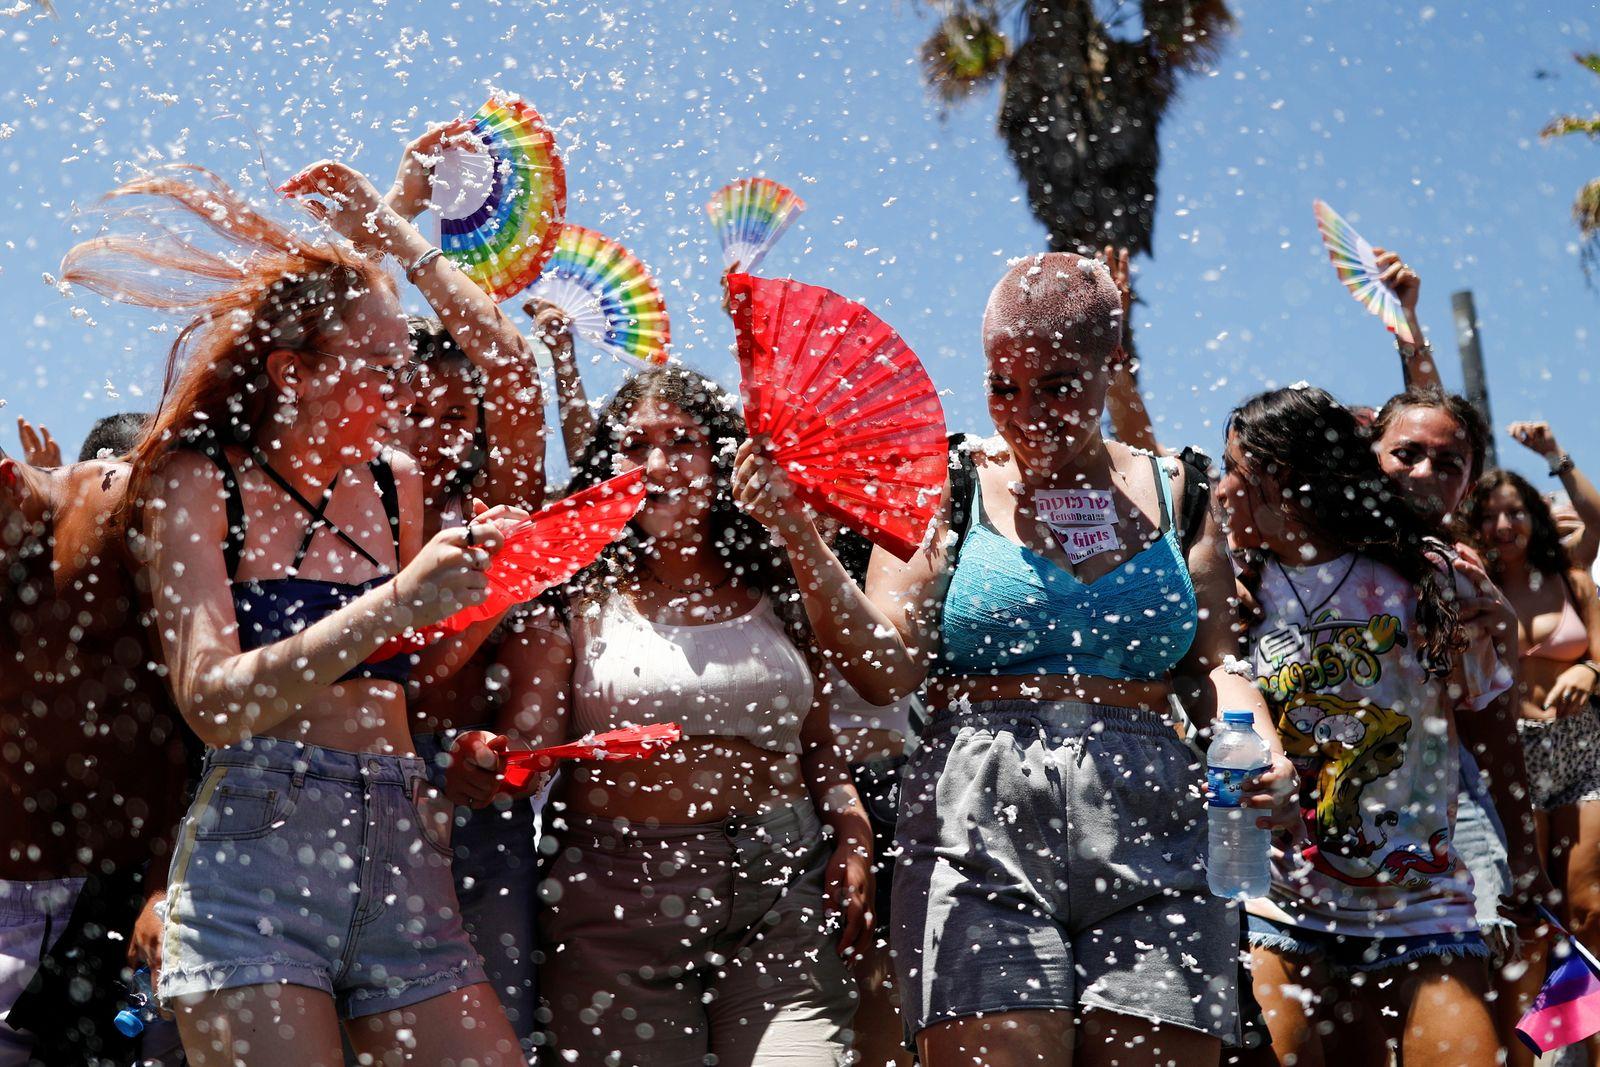 Gay pride parade in Tel Aviv